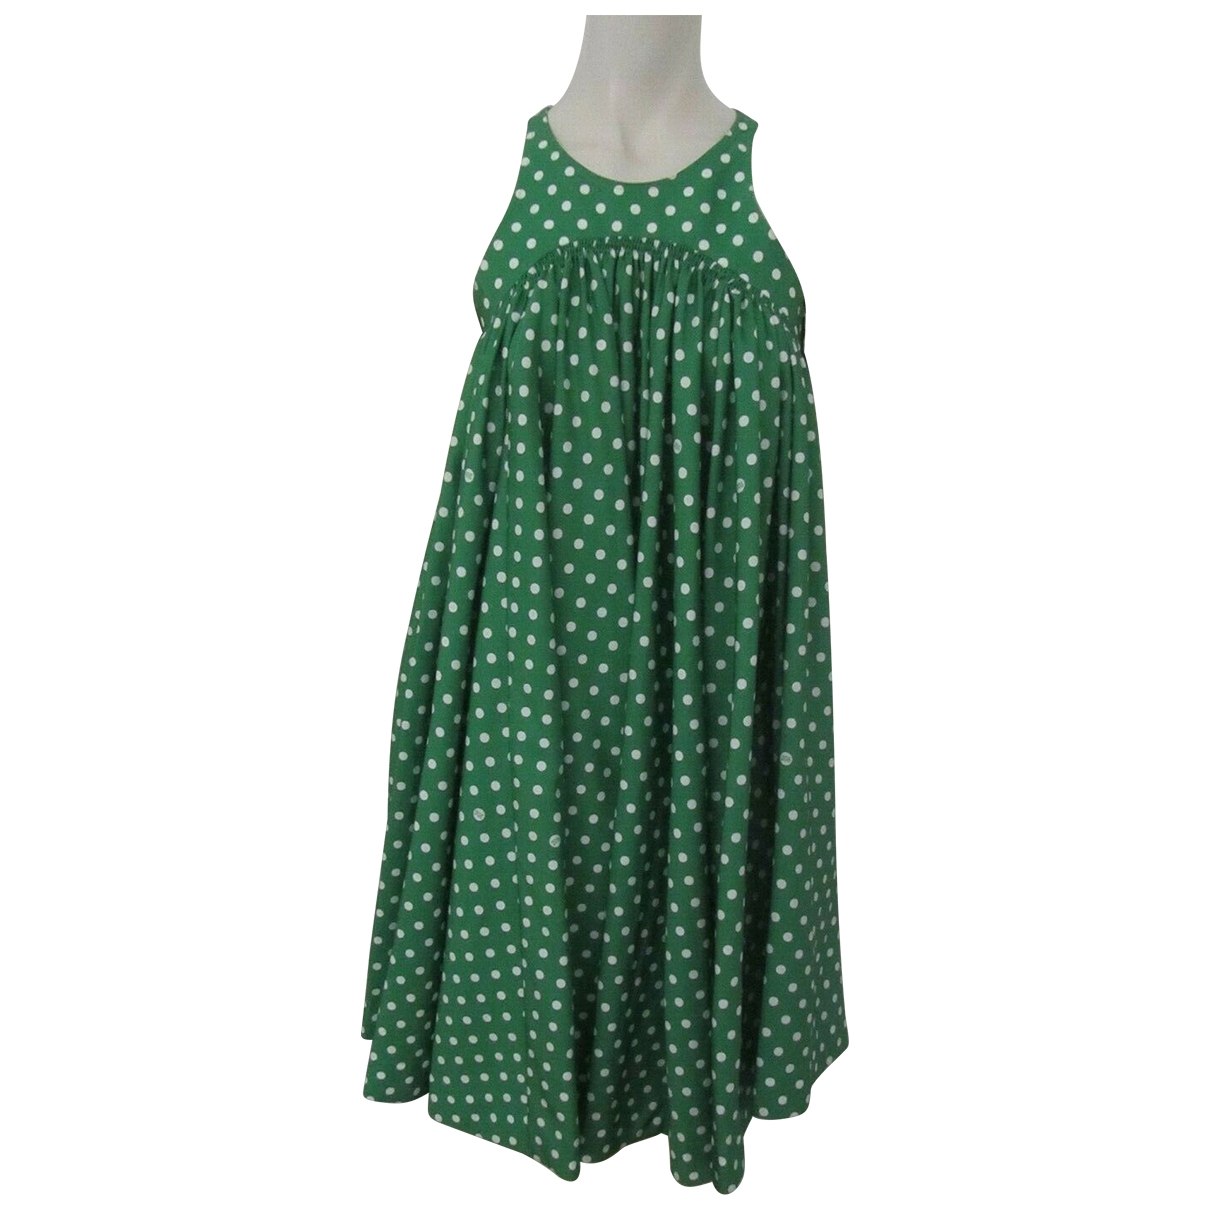 Calvin Klein 205w39nyc \N Kleid in  Gruen Synthetik